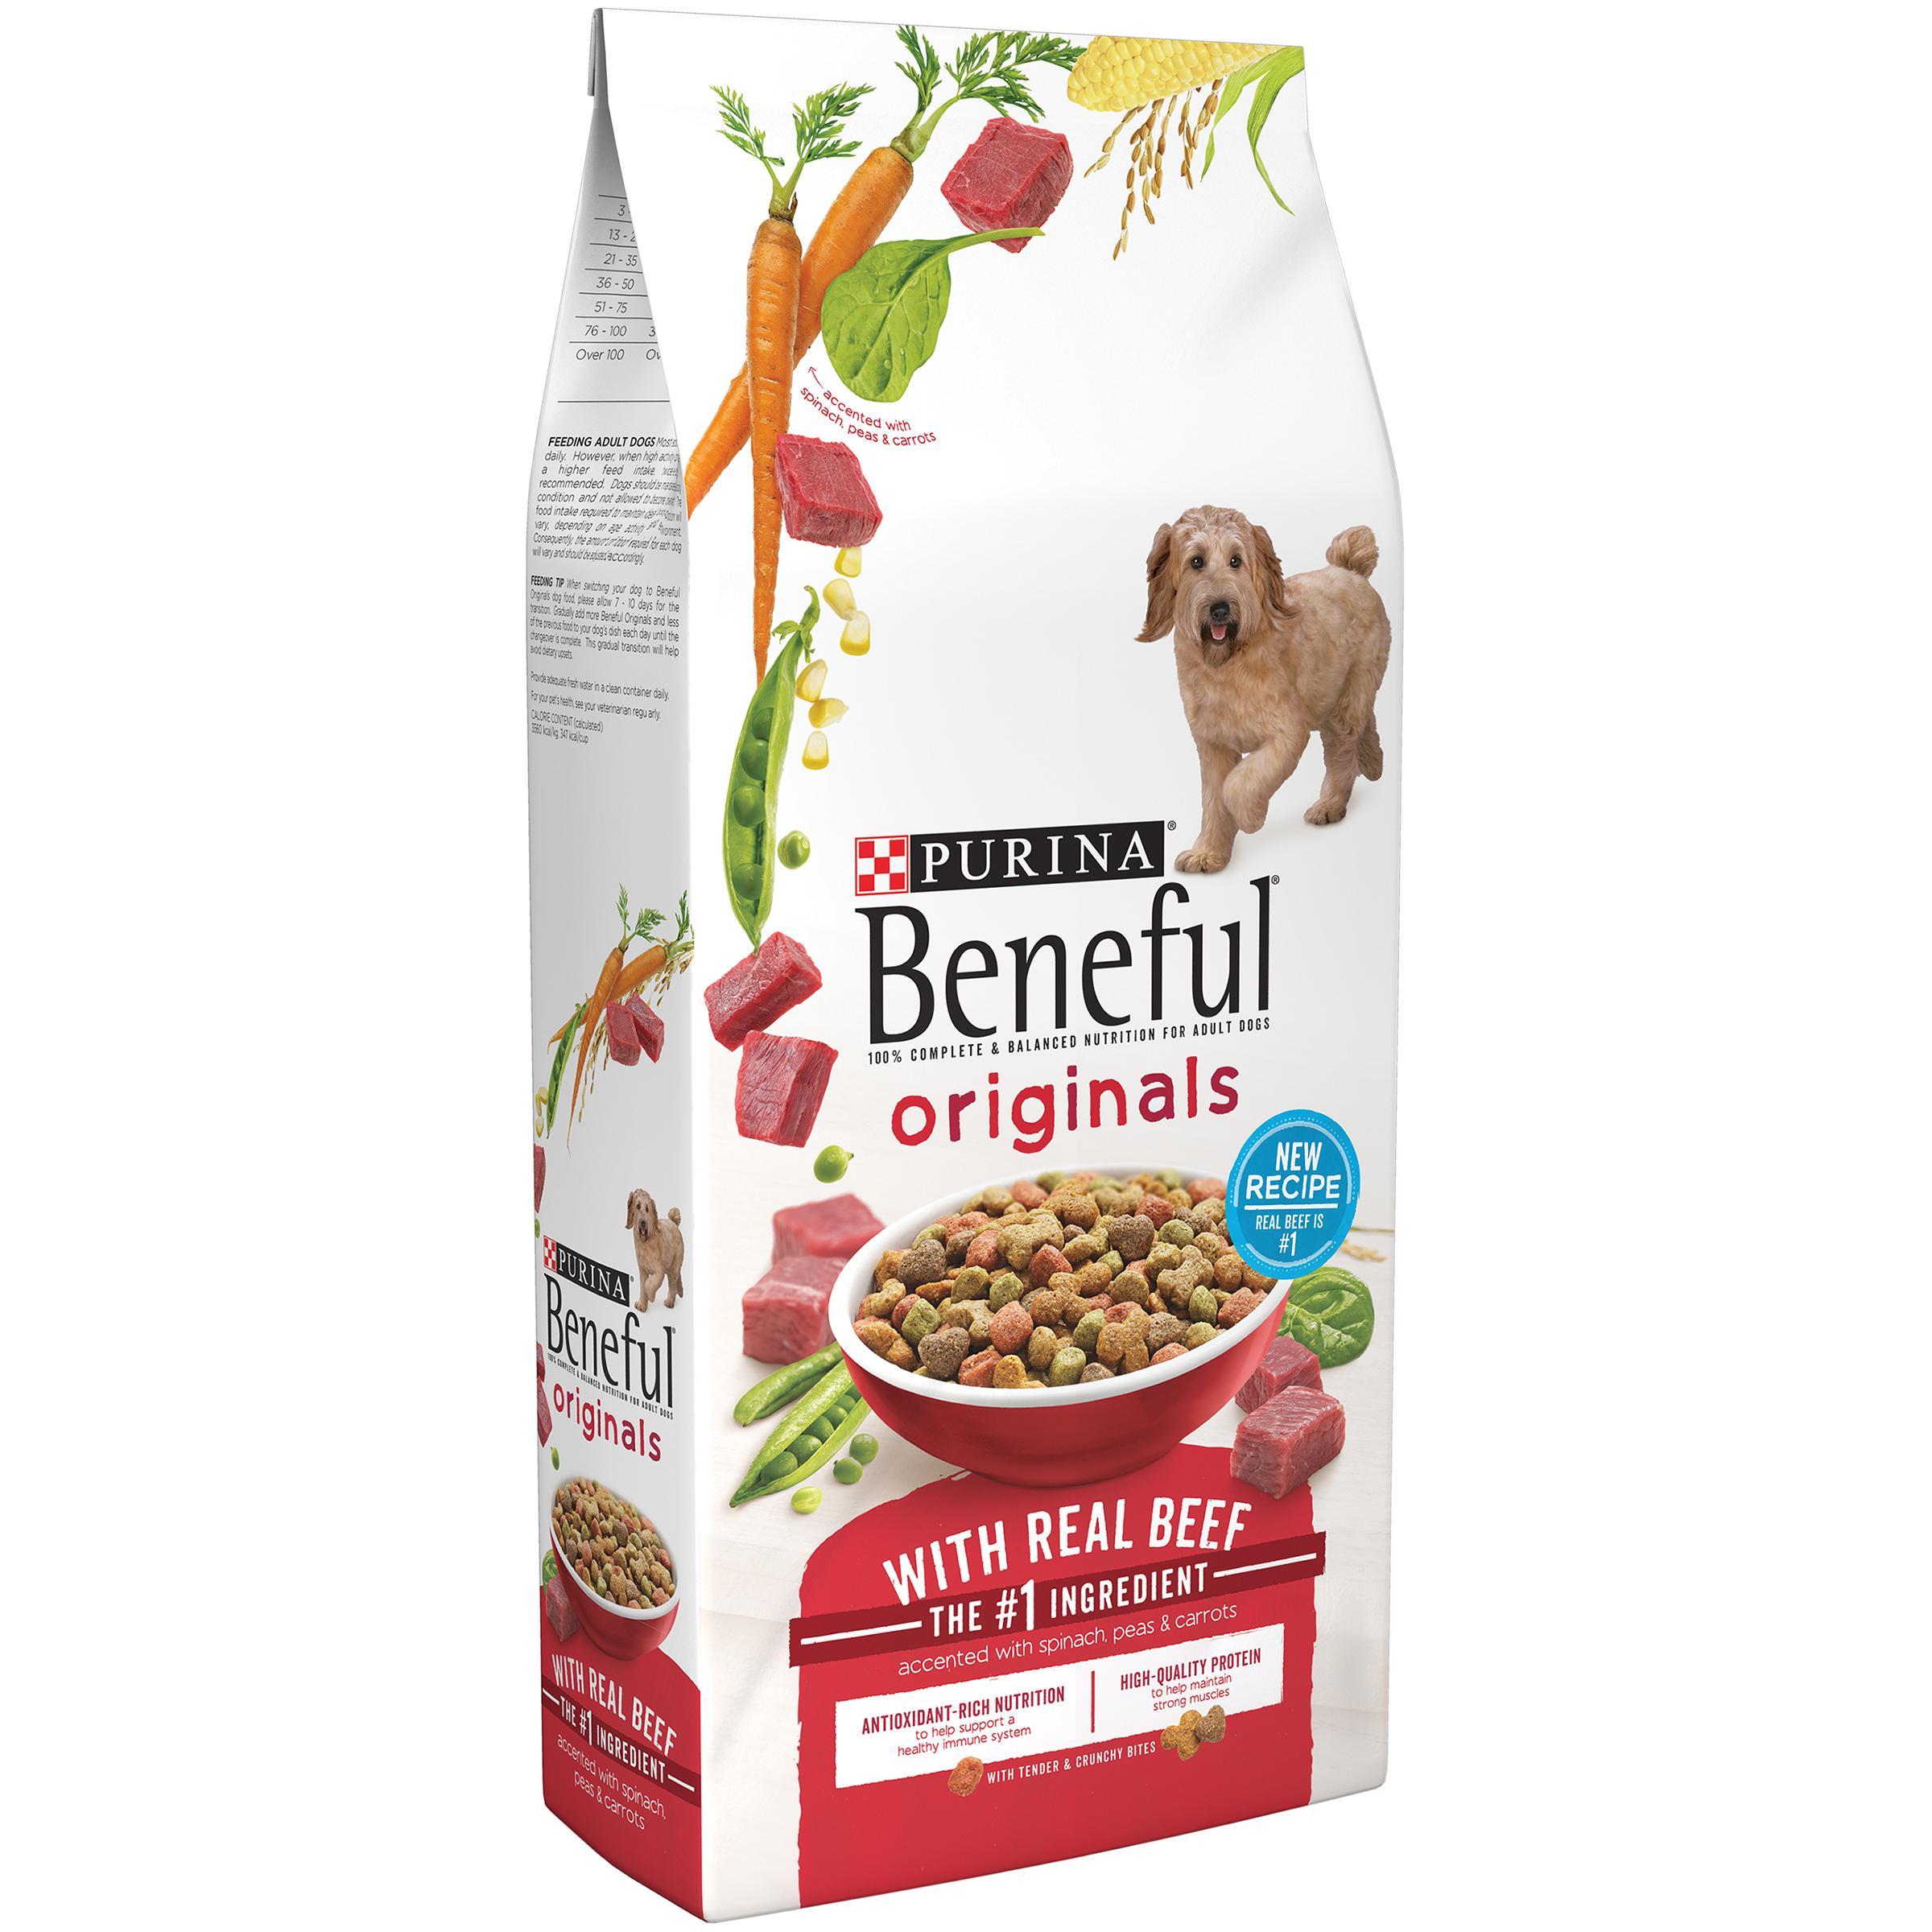 Purina Beneful Originals With Real Beef Dog Food 15.5 lb. Bag